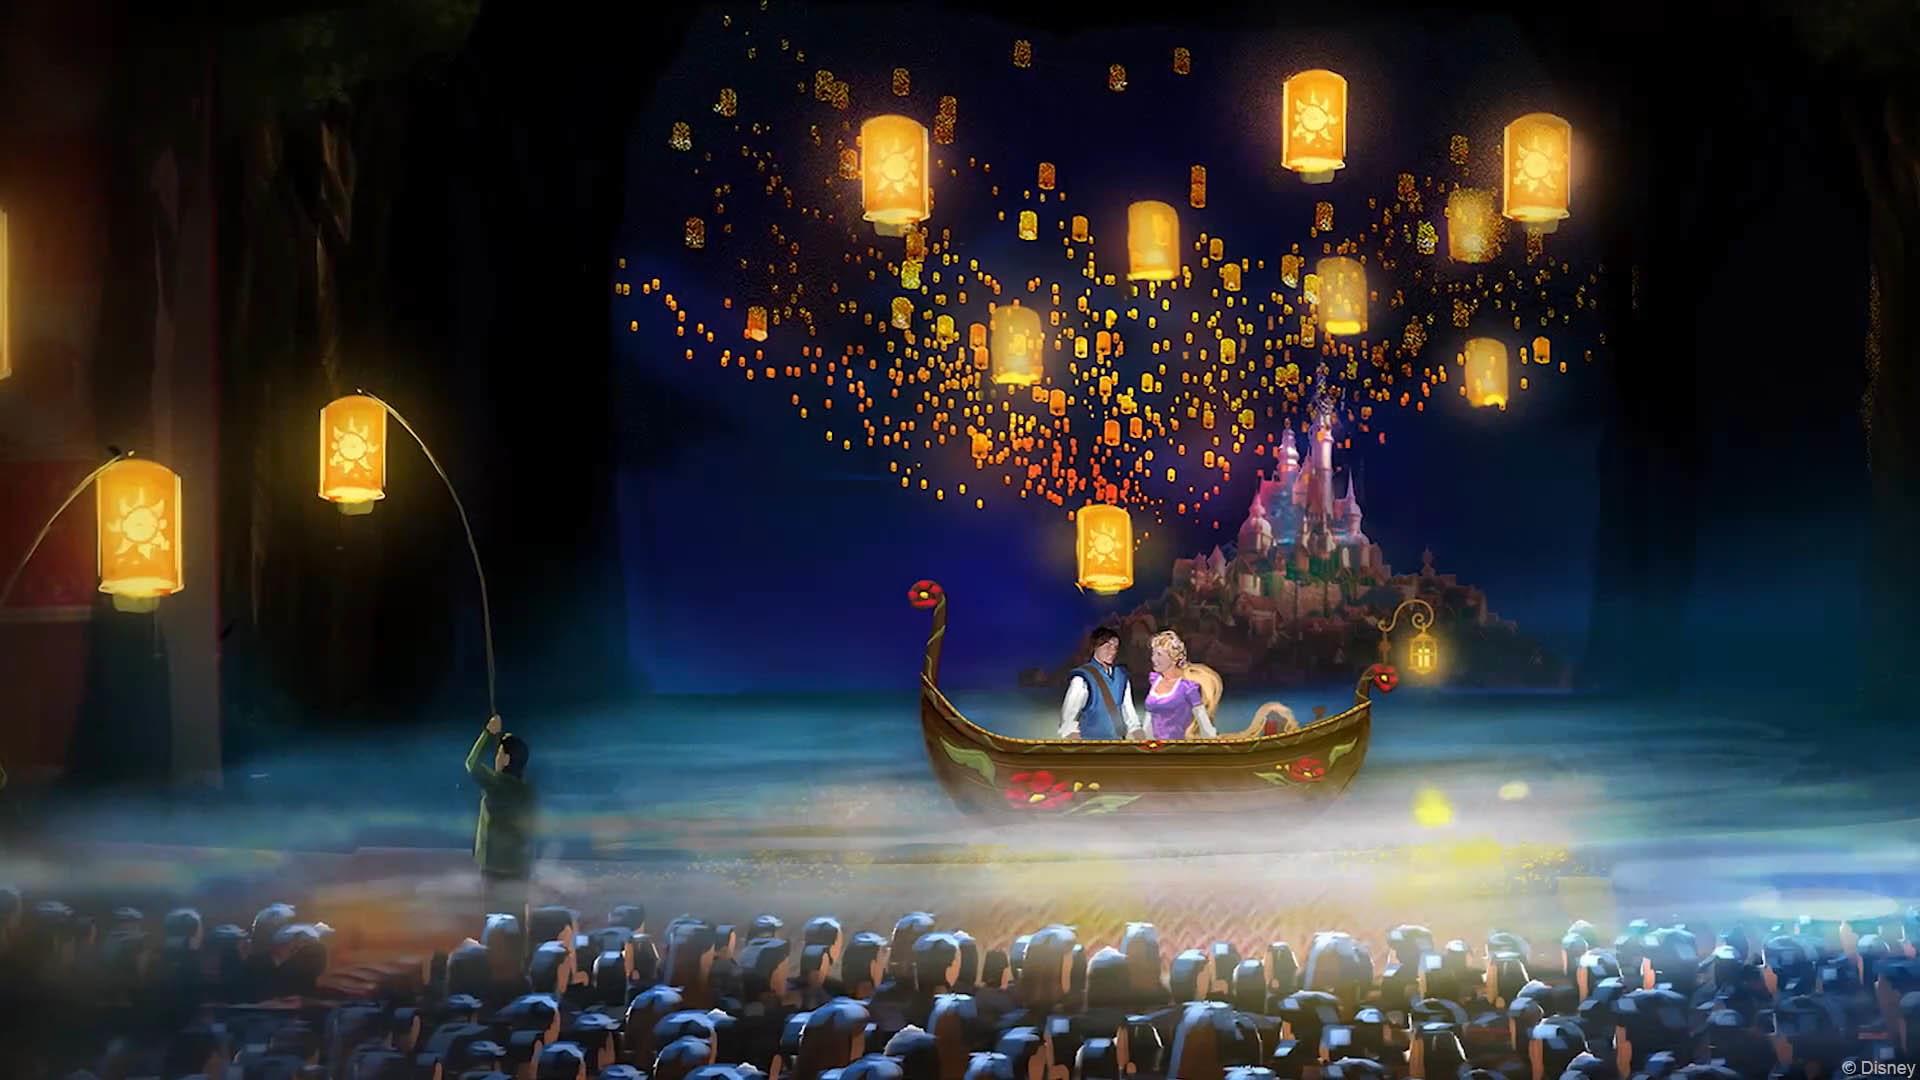 DCL Tangled Musical Set Theatre Lake Floating Lanterns Mockup